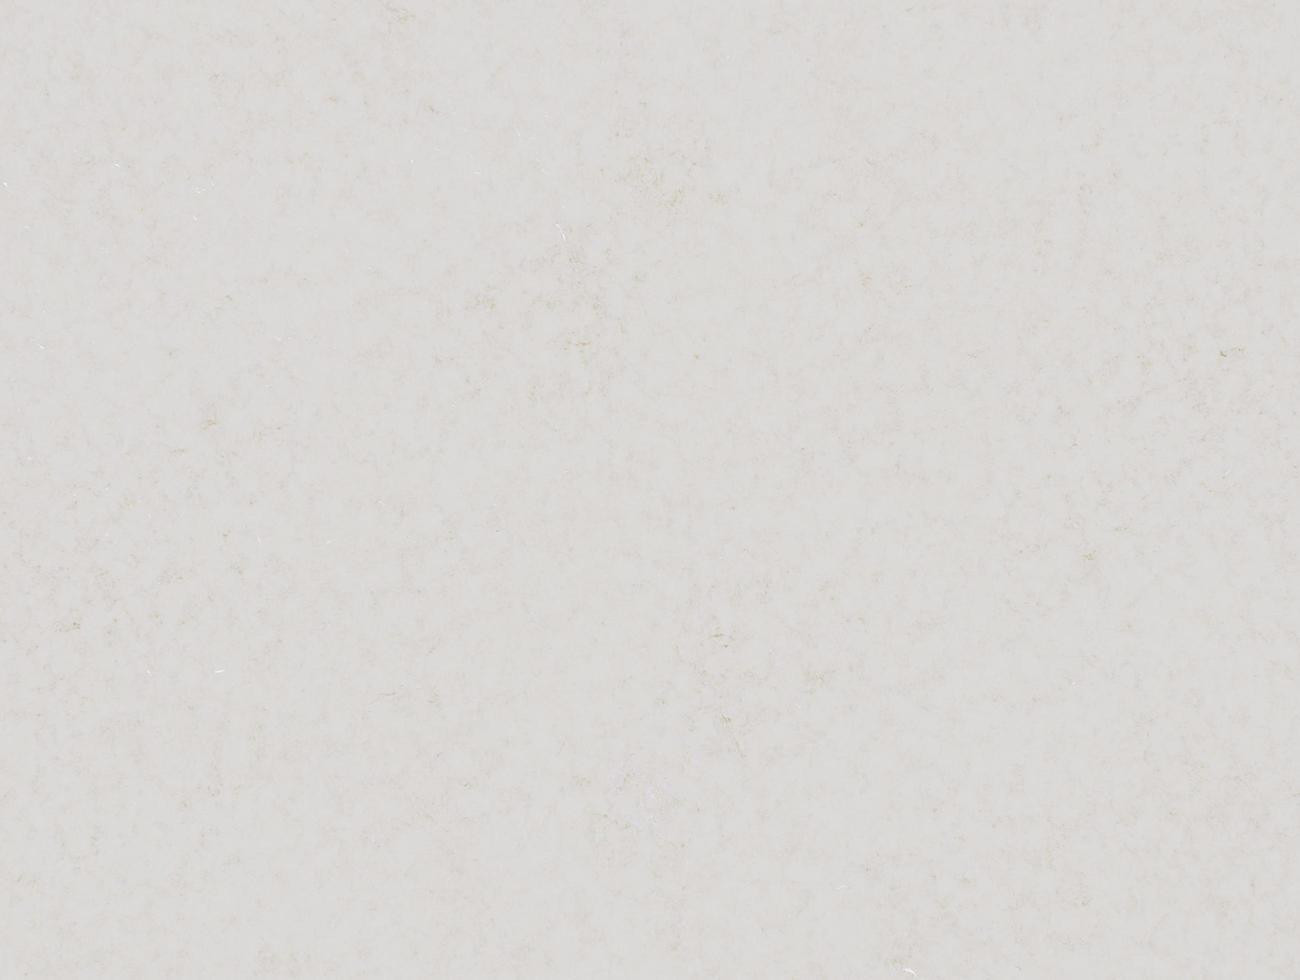 beige saubere Wand Textur foto